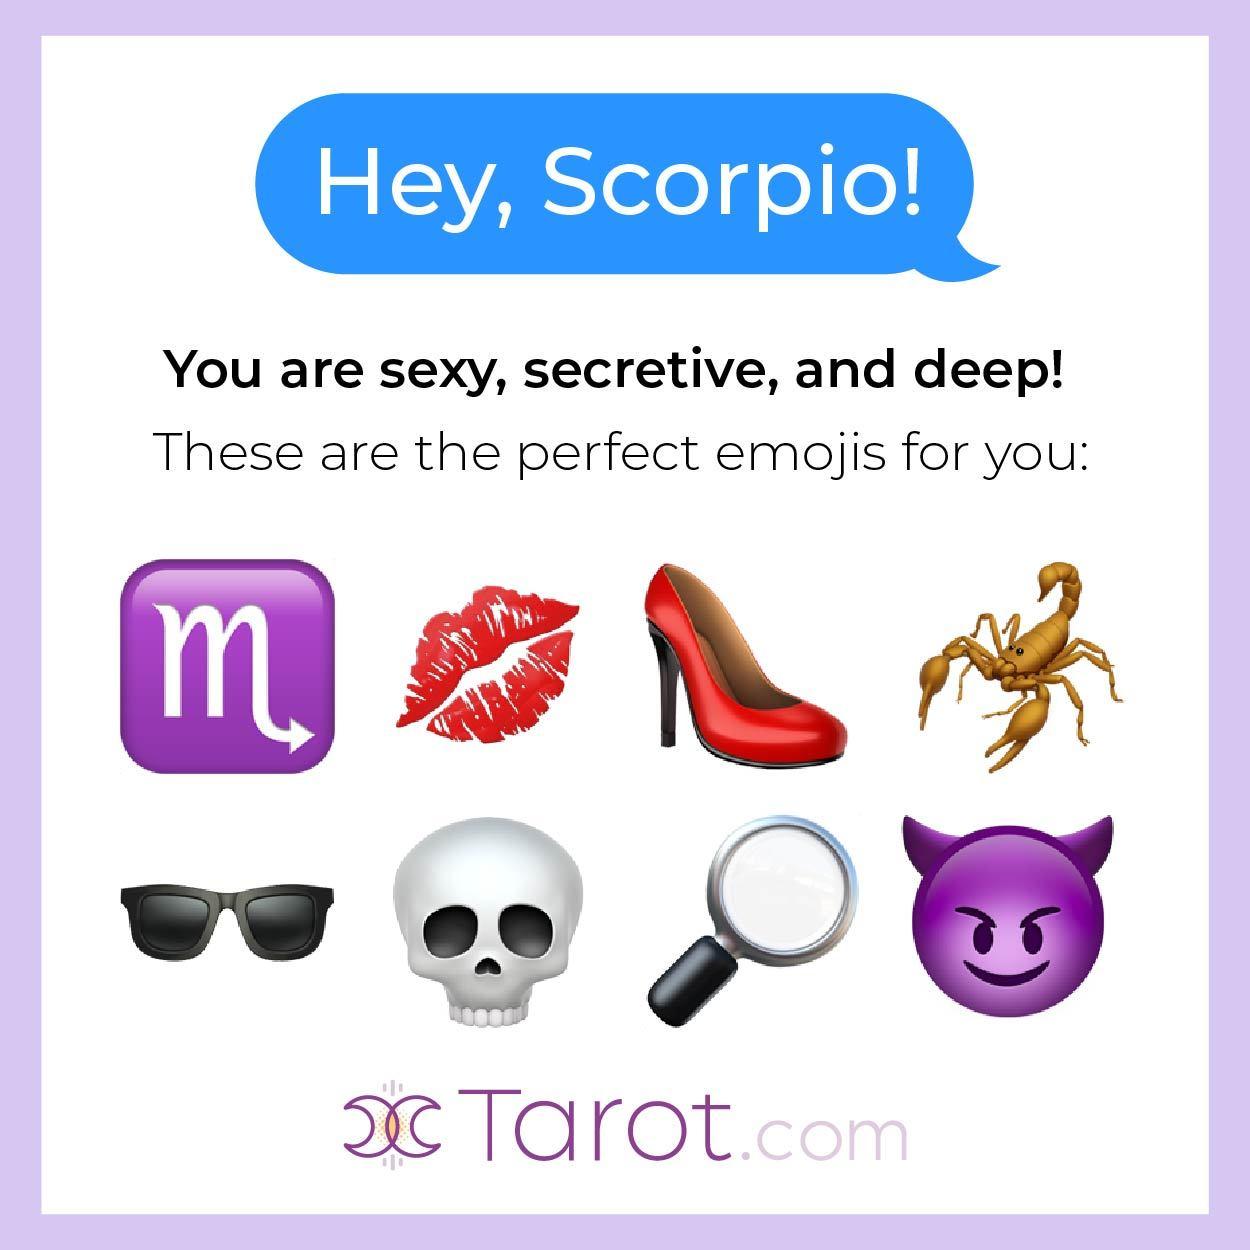 Scorpio Emojis